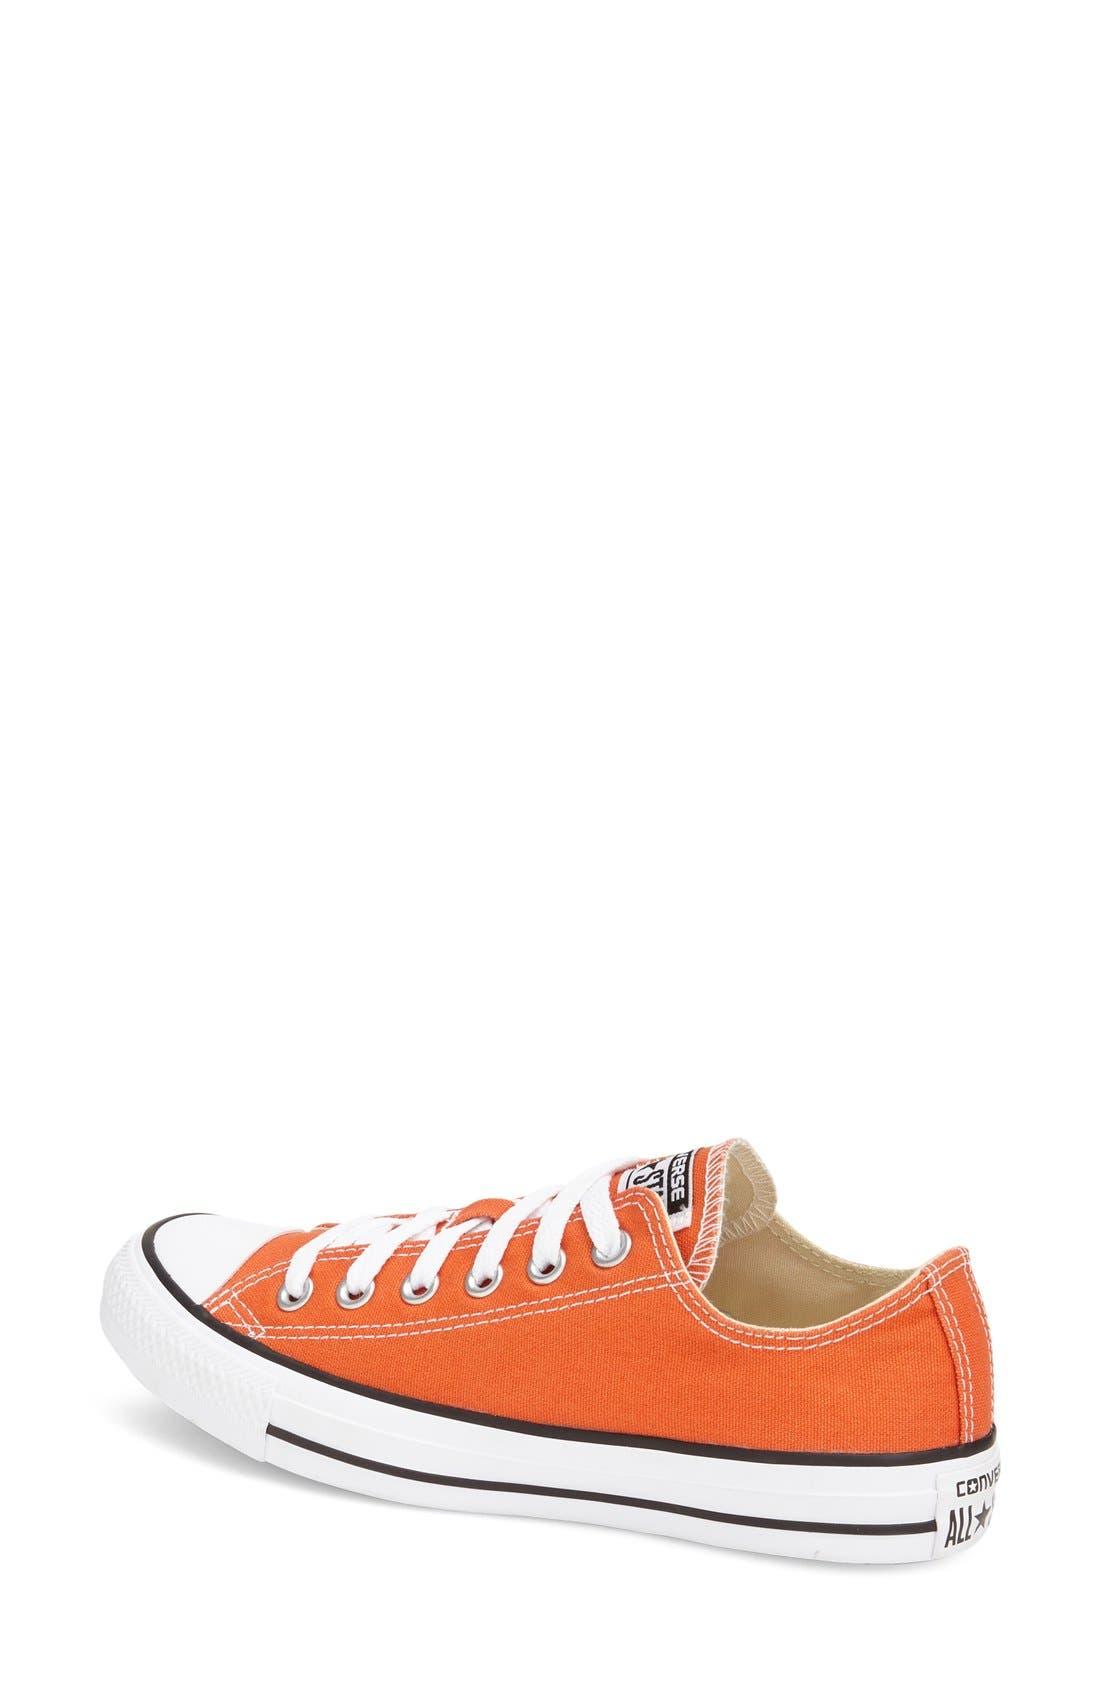 Alternate Image 2  - Converse Chuck Taylor® All Star® 'Seasonal Ox' Low Top Sneaker (Women)